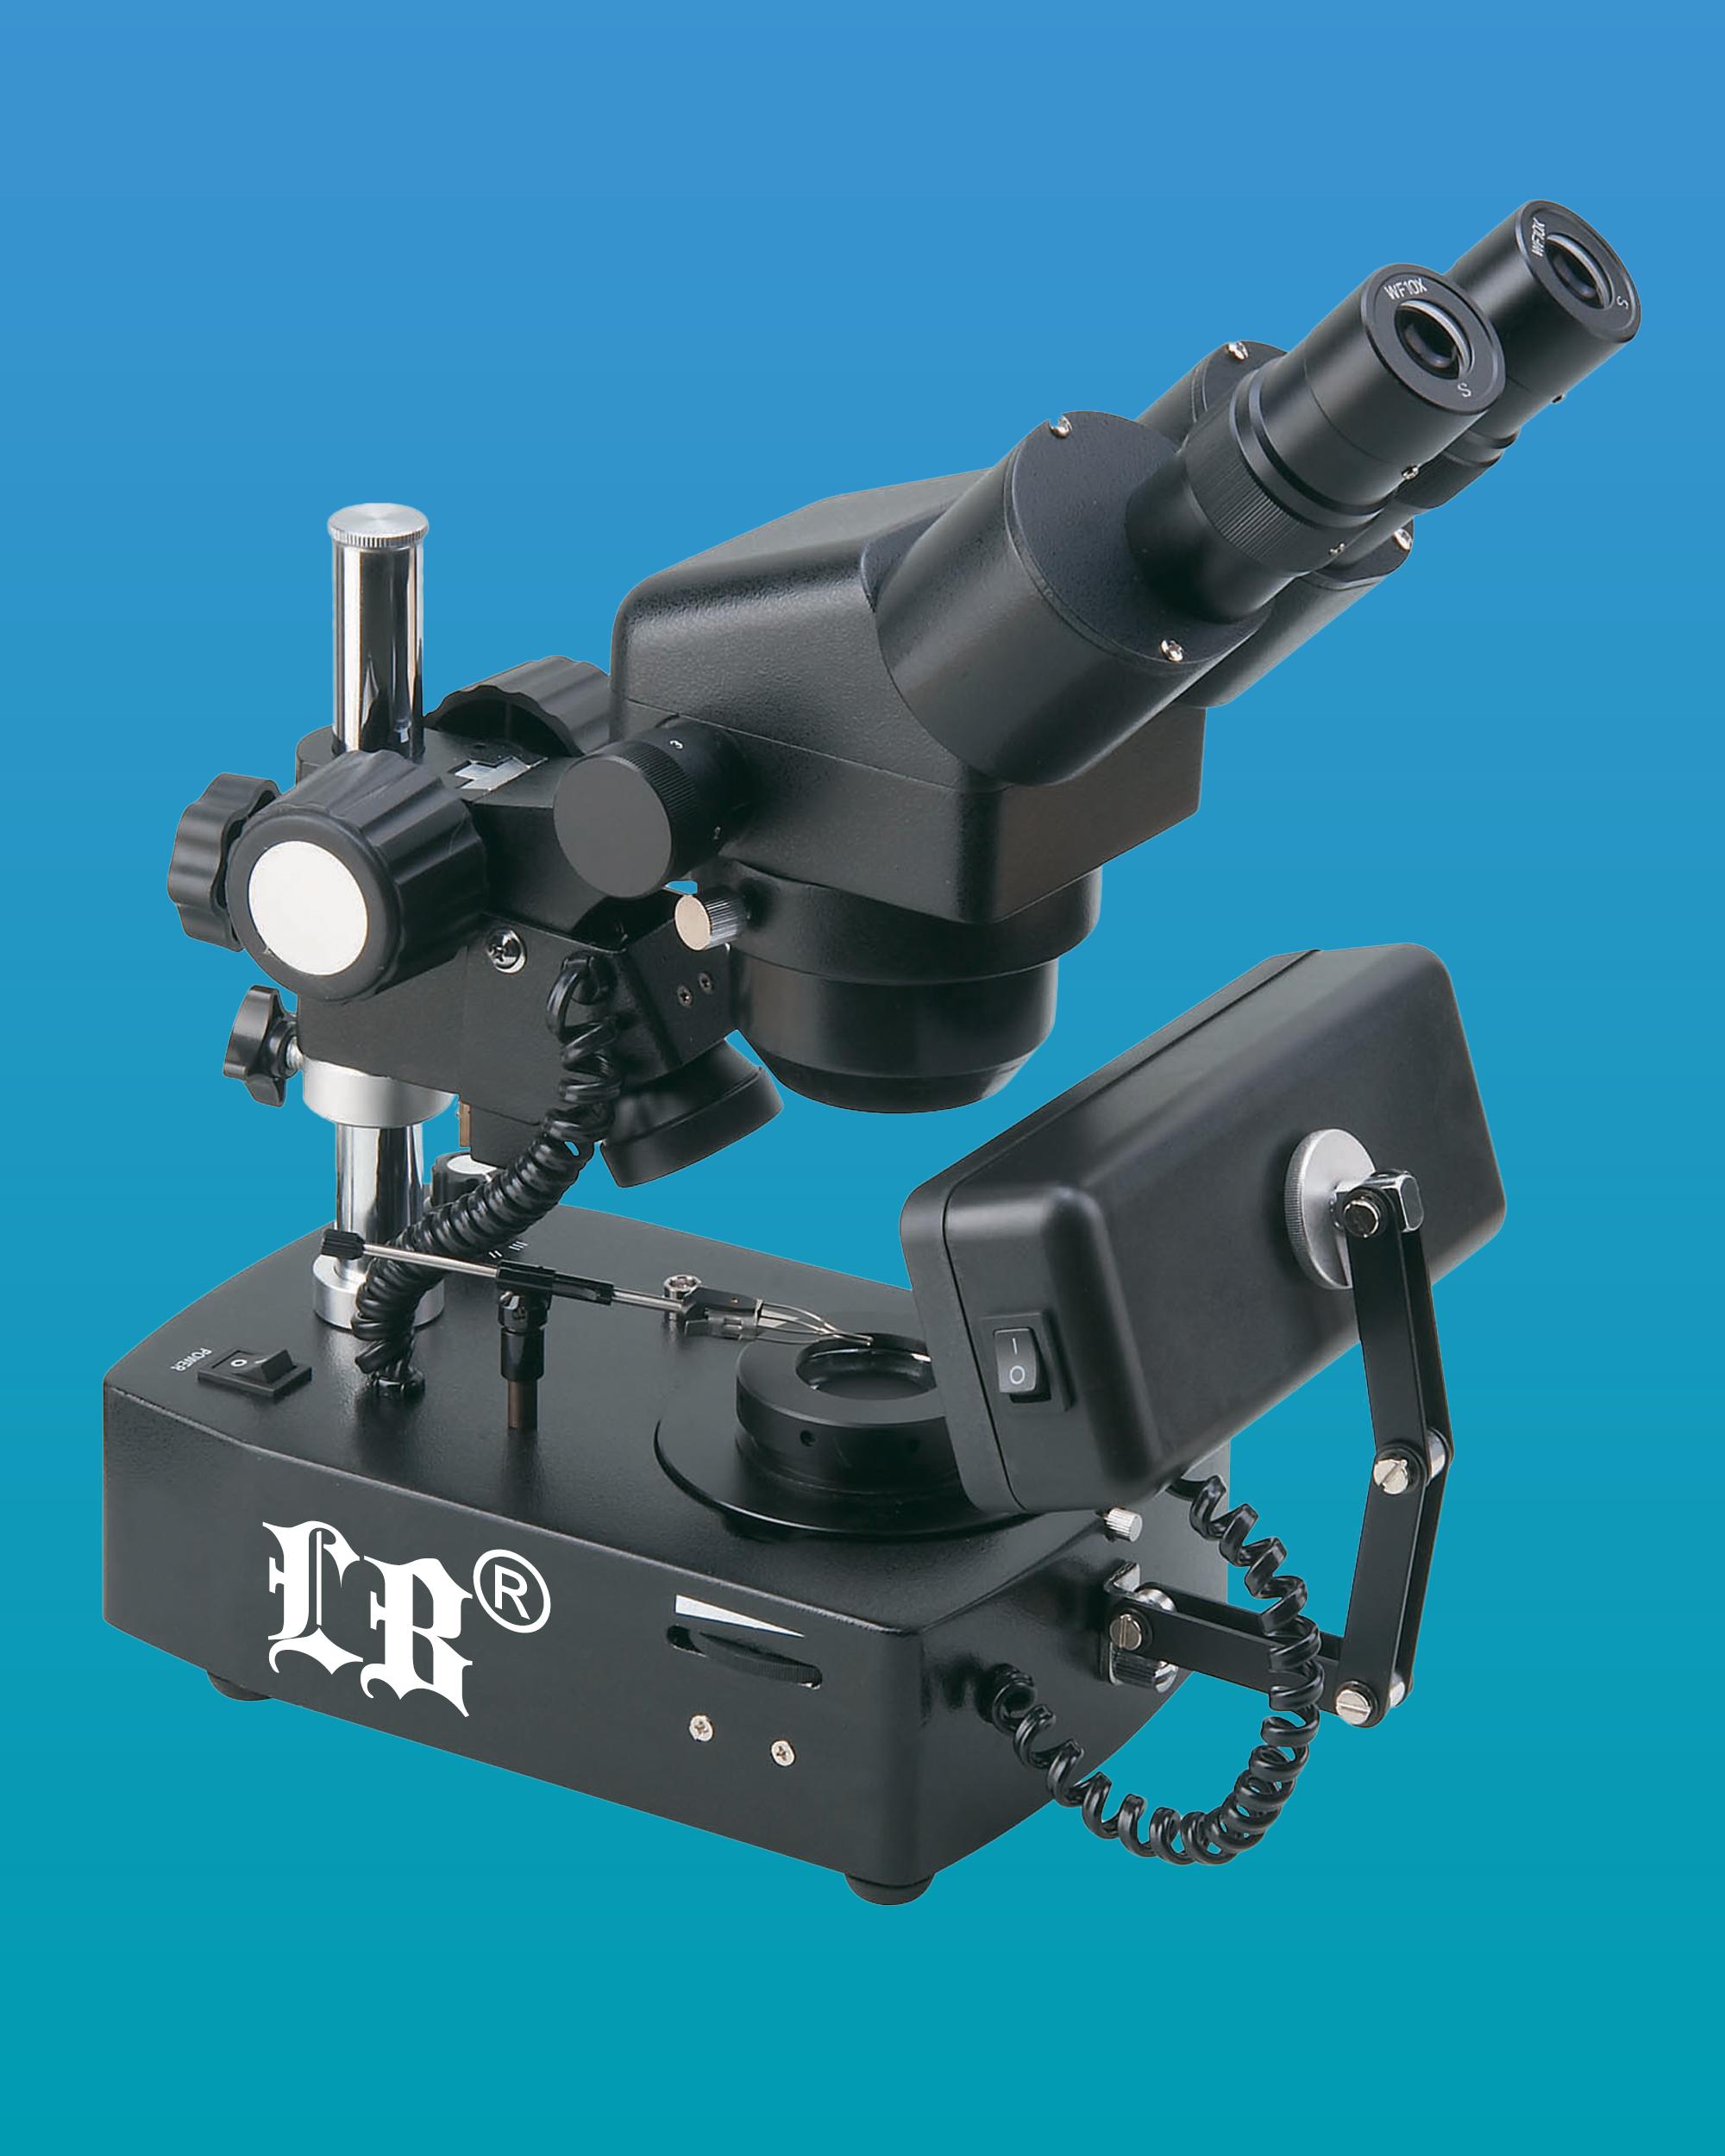 [LB-863] Binocular Gemological Microscope w/ Wide Field & Fluorescent Illumination